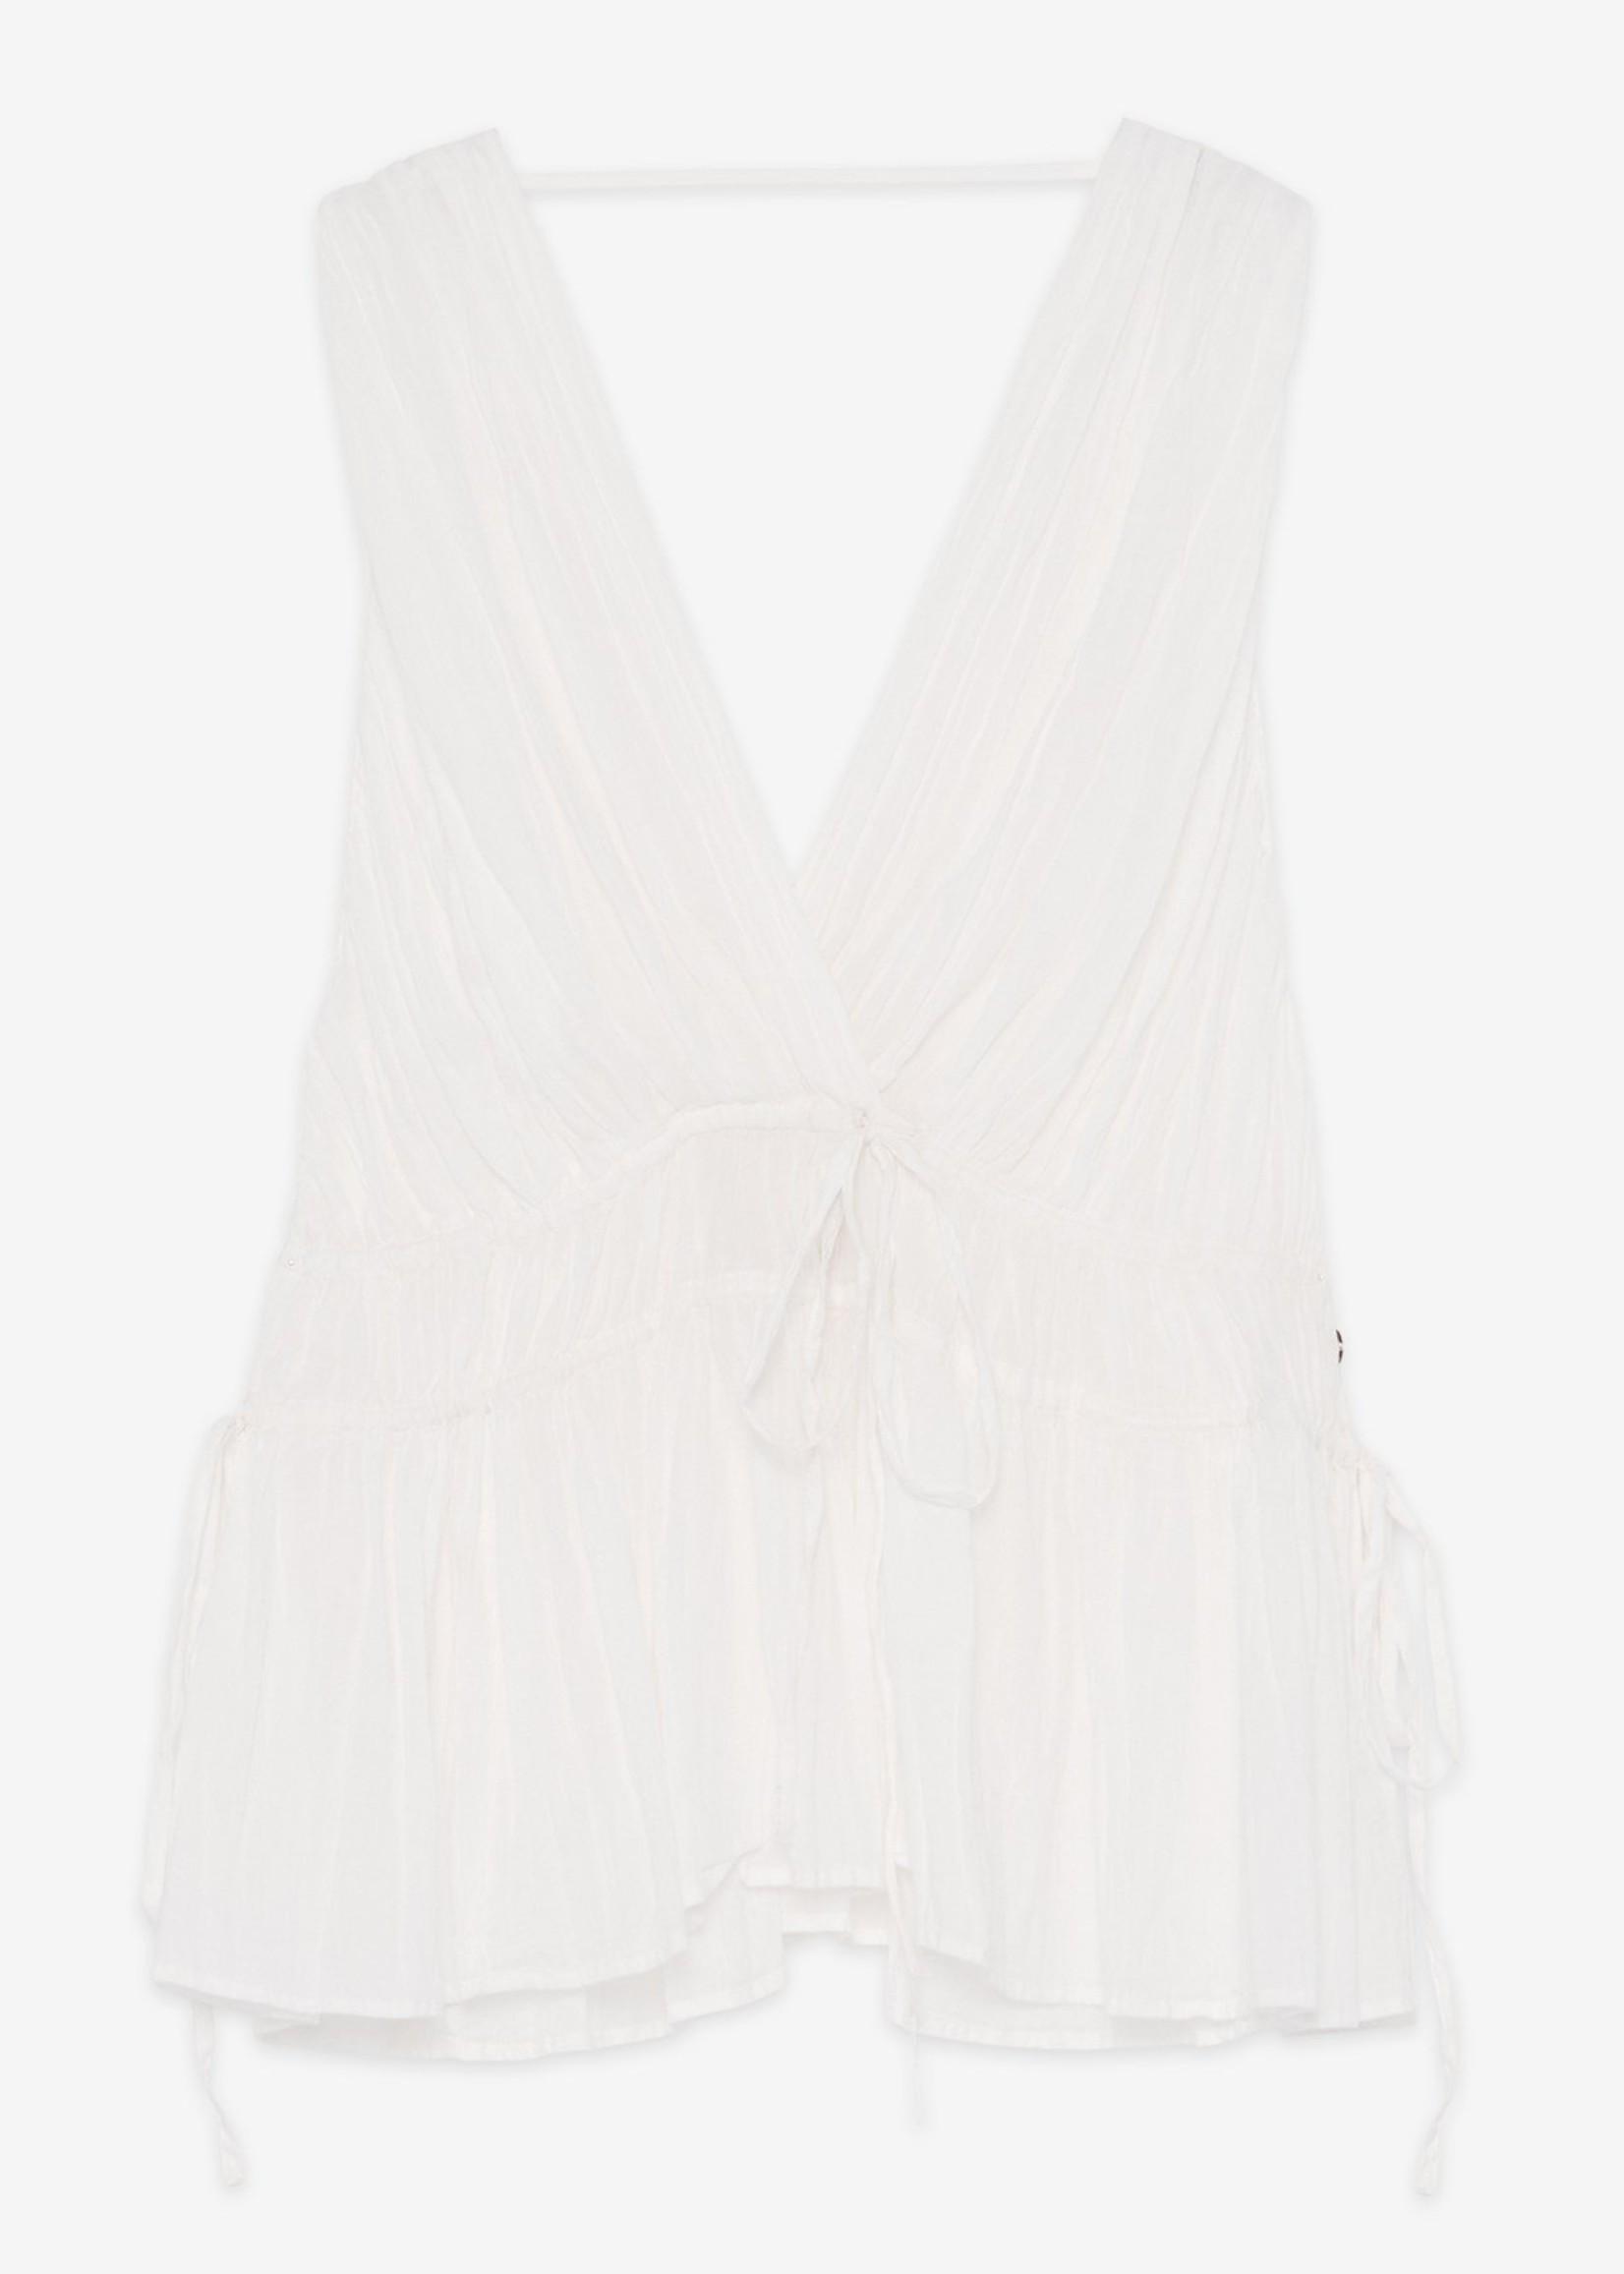 Ottod'Ame Cotton Top w/ Tucks - DC8865